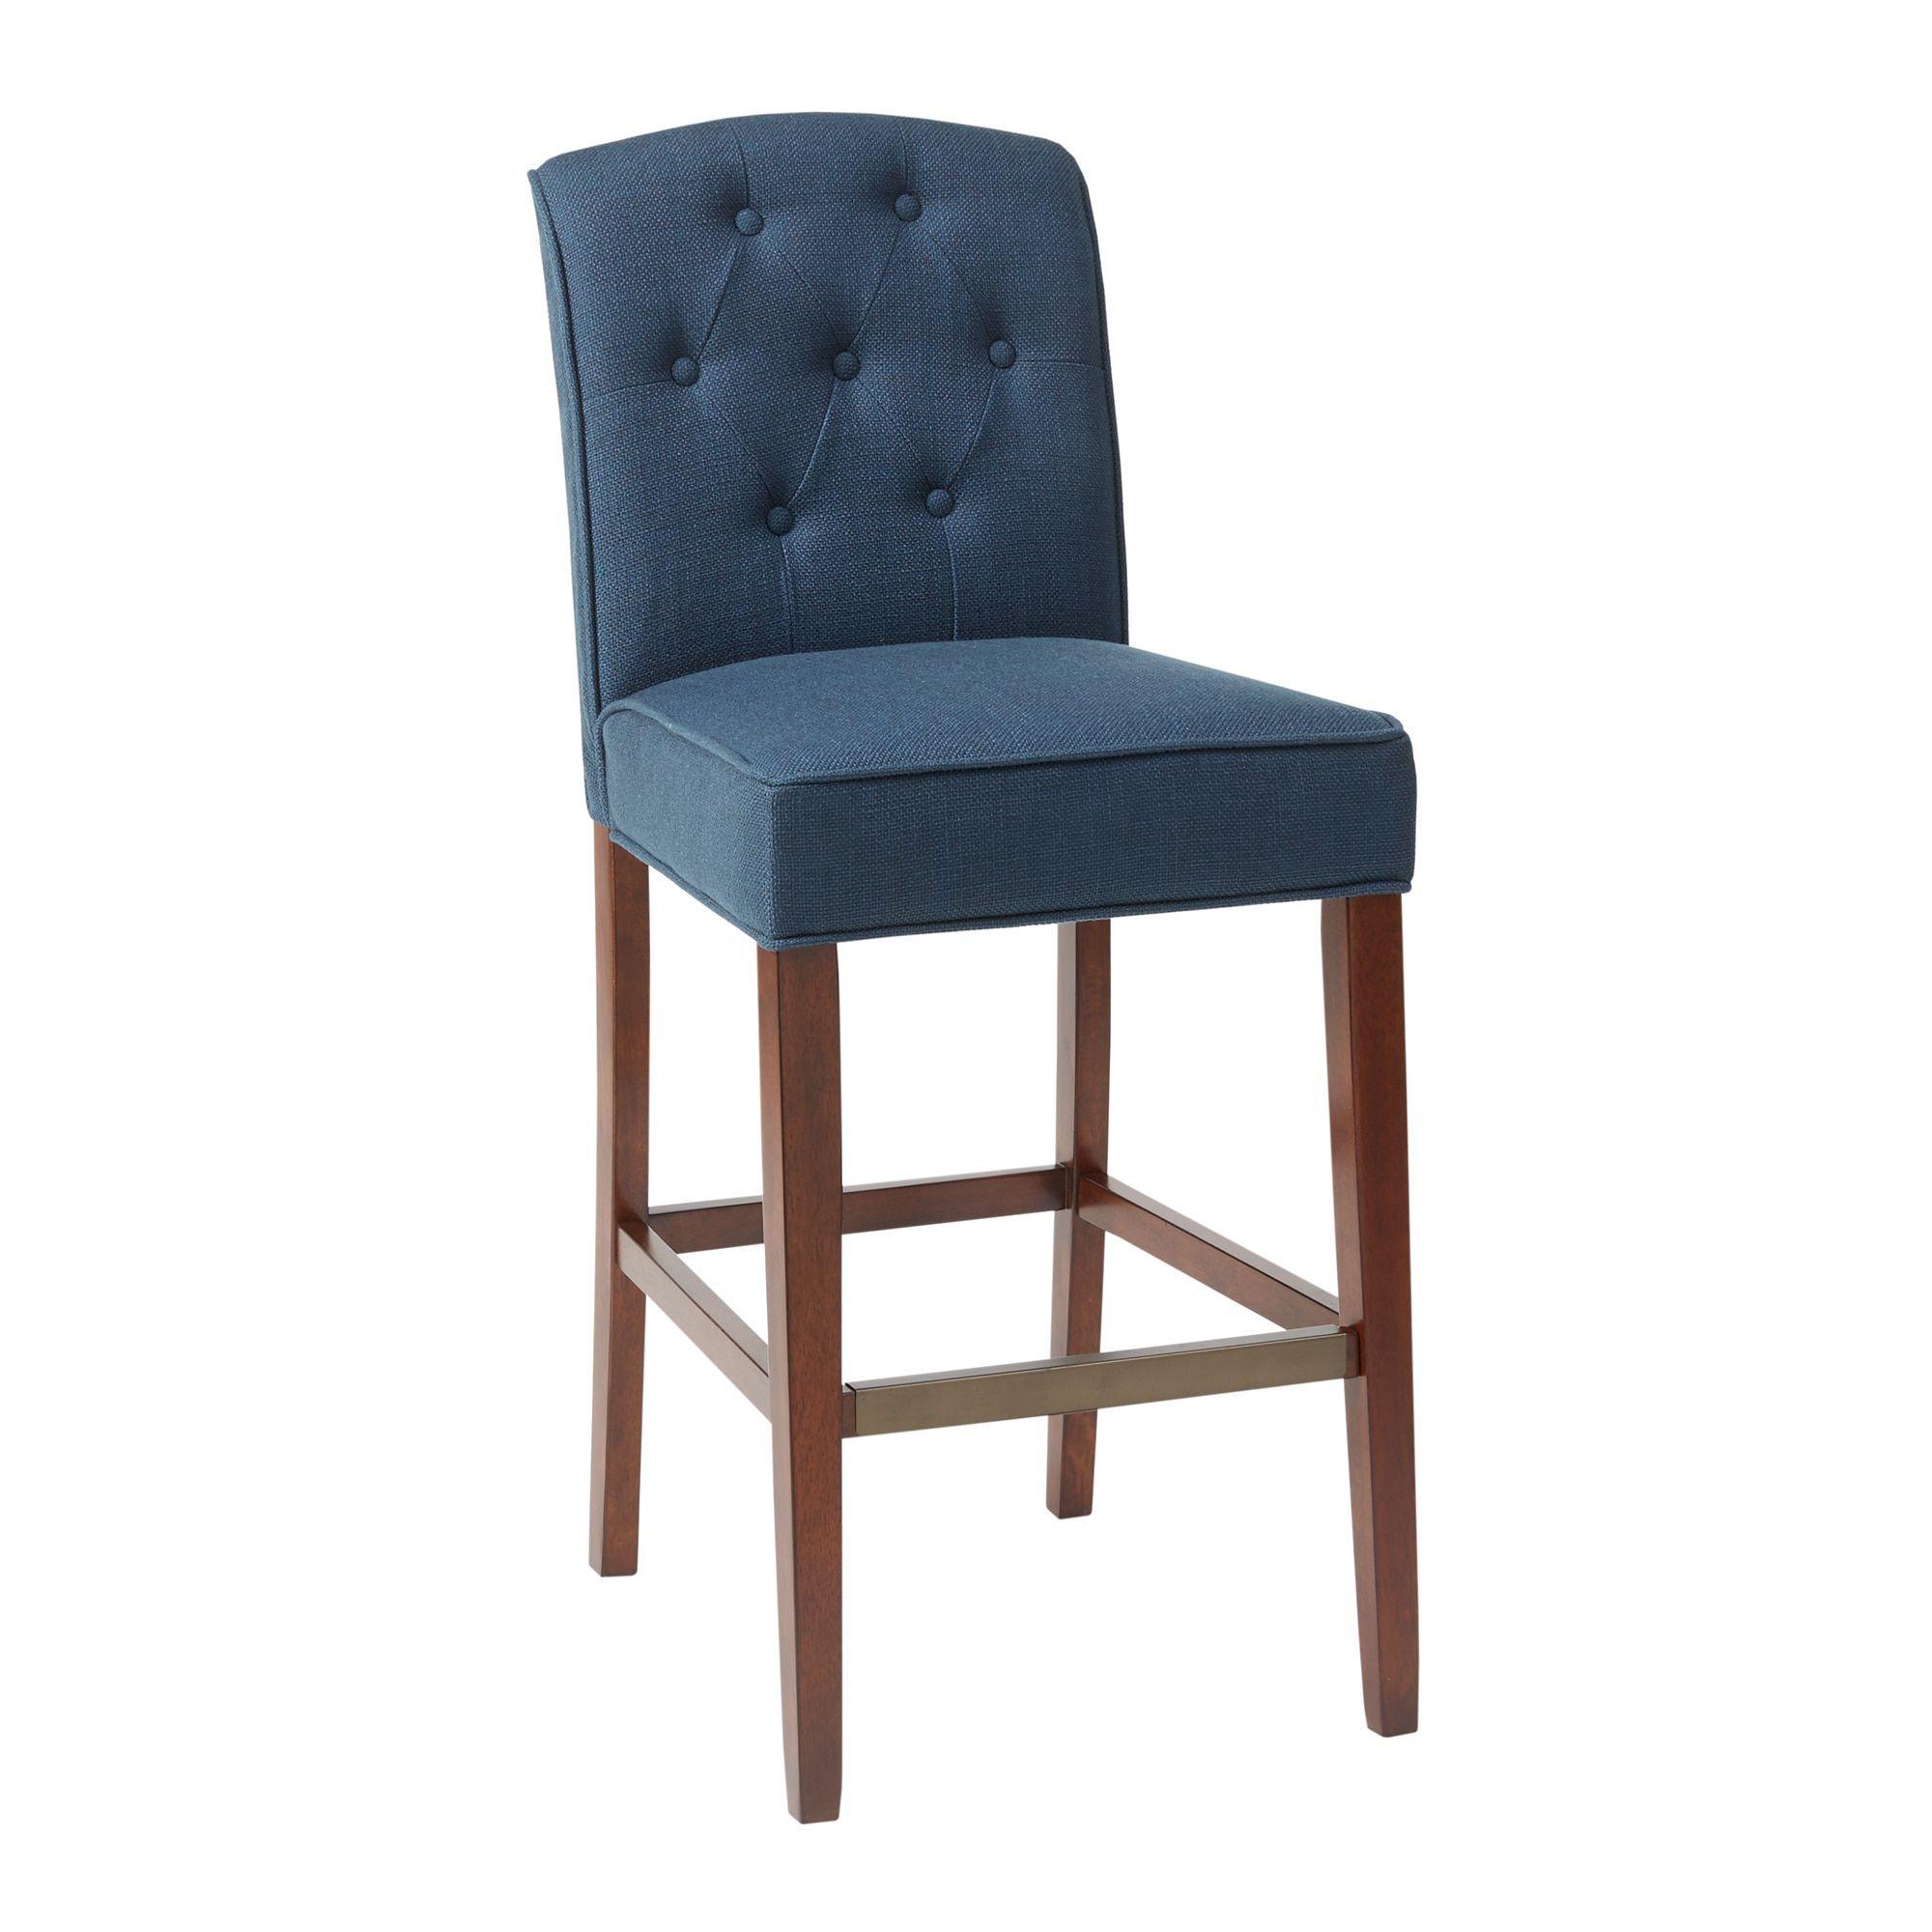 Awesome Madison Park Misha Navy Tufted 30 Inch Bar Stool 19 5 Ibusinesslaw Wood Chair Design Ideas Ibusinesslaworg